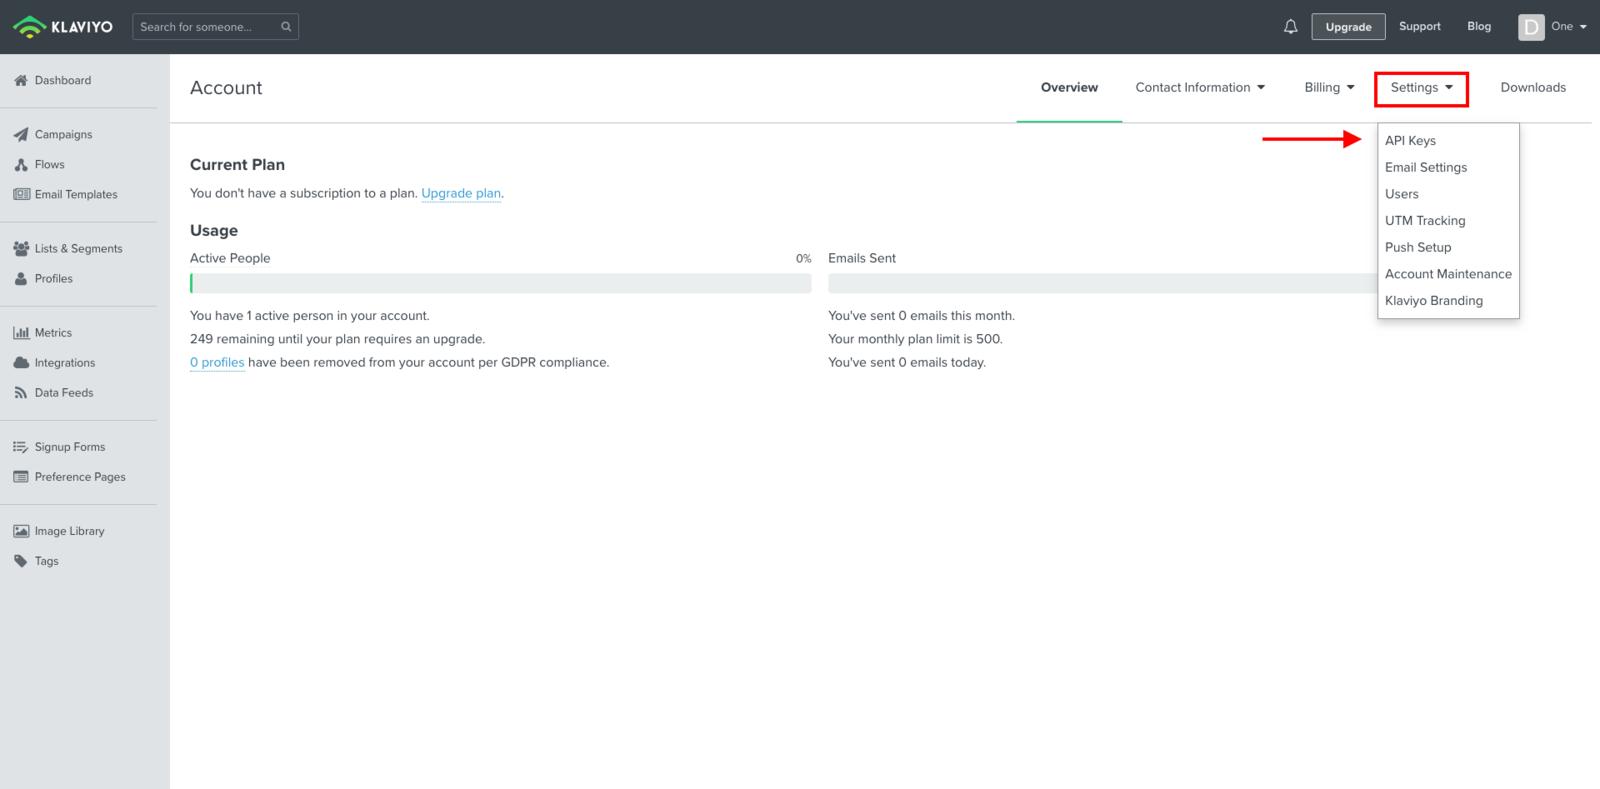 Klaviyo -> Settings -> API Key